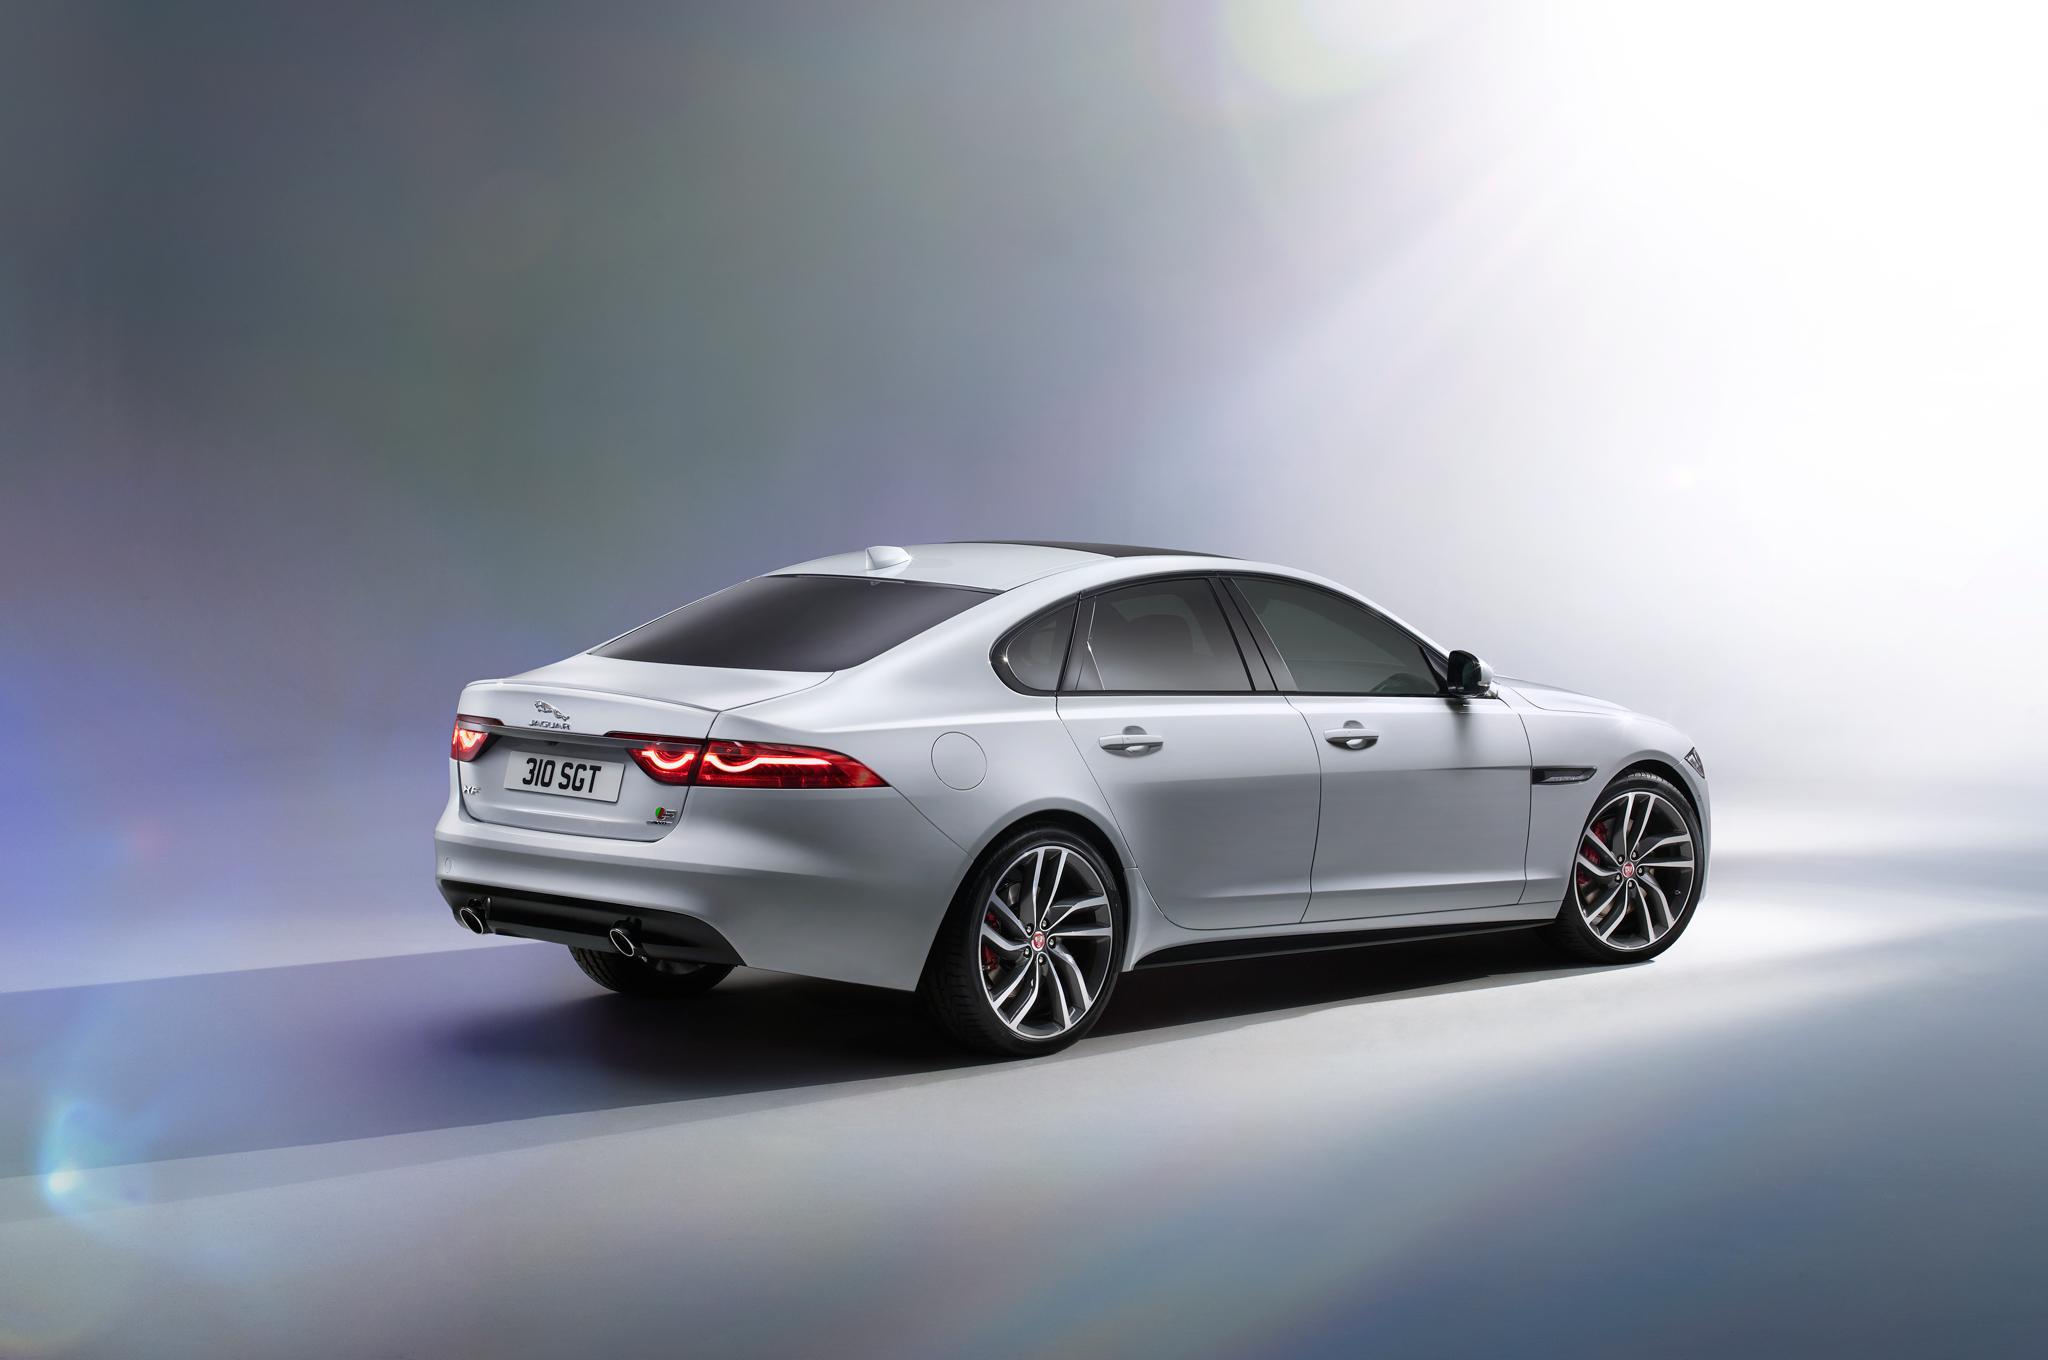 2016 Jaguar XF rear three quarter press shot